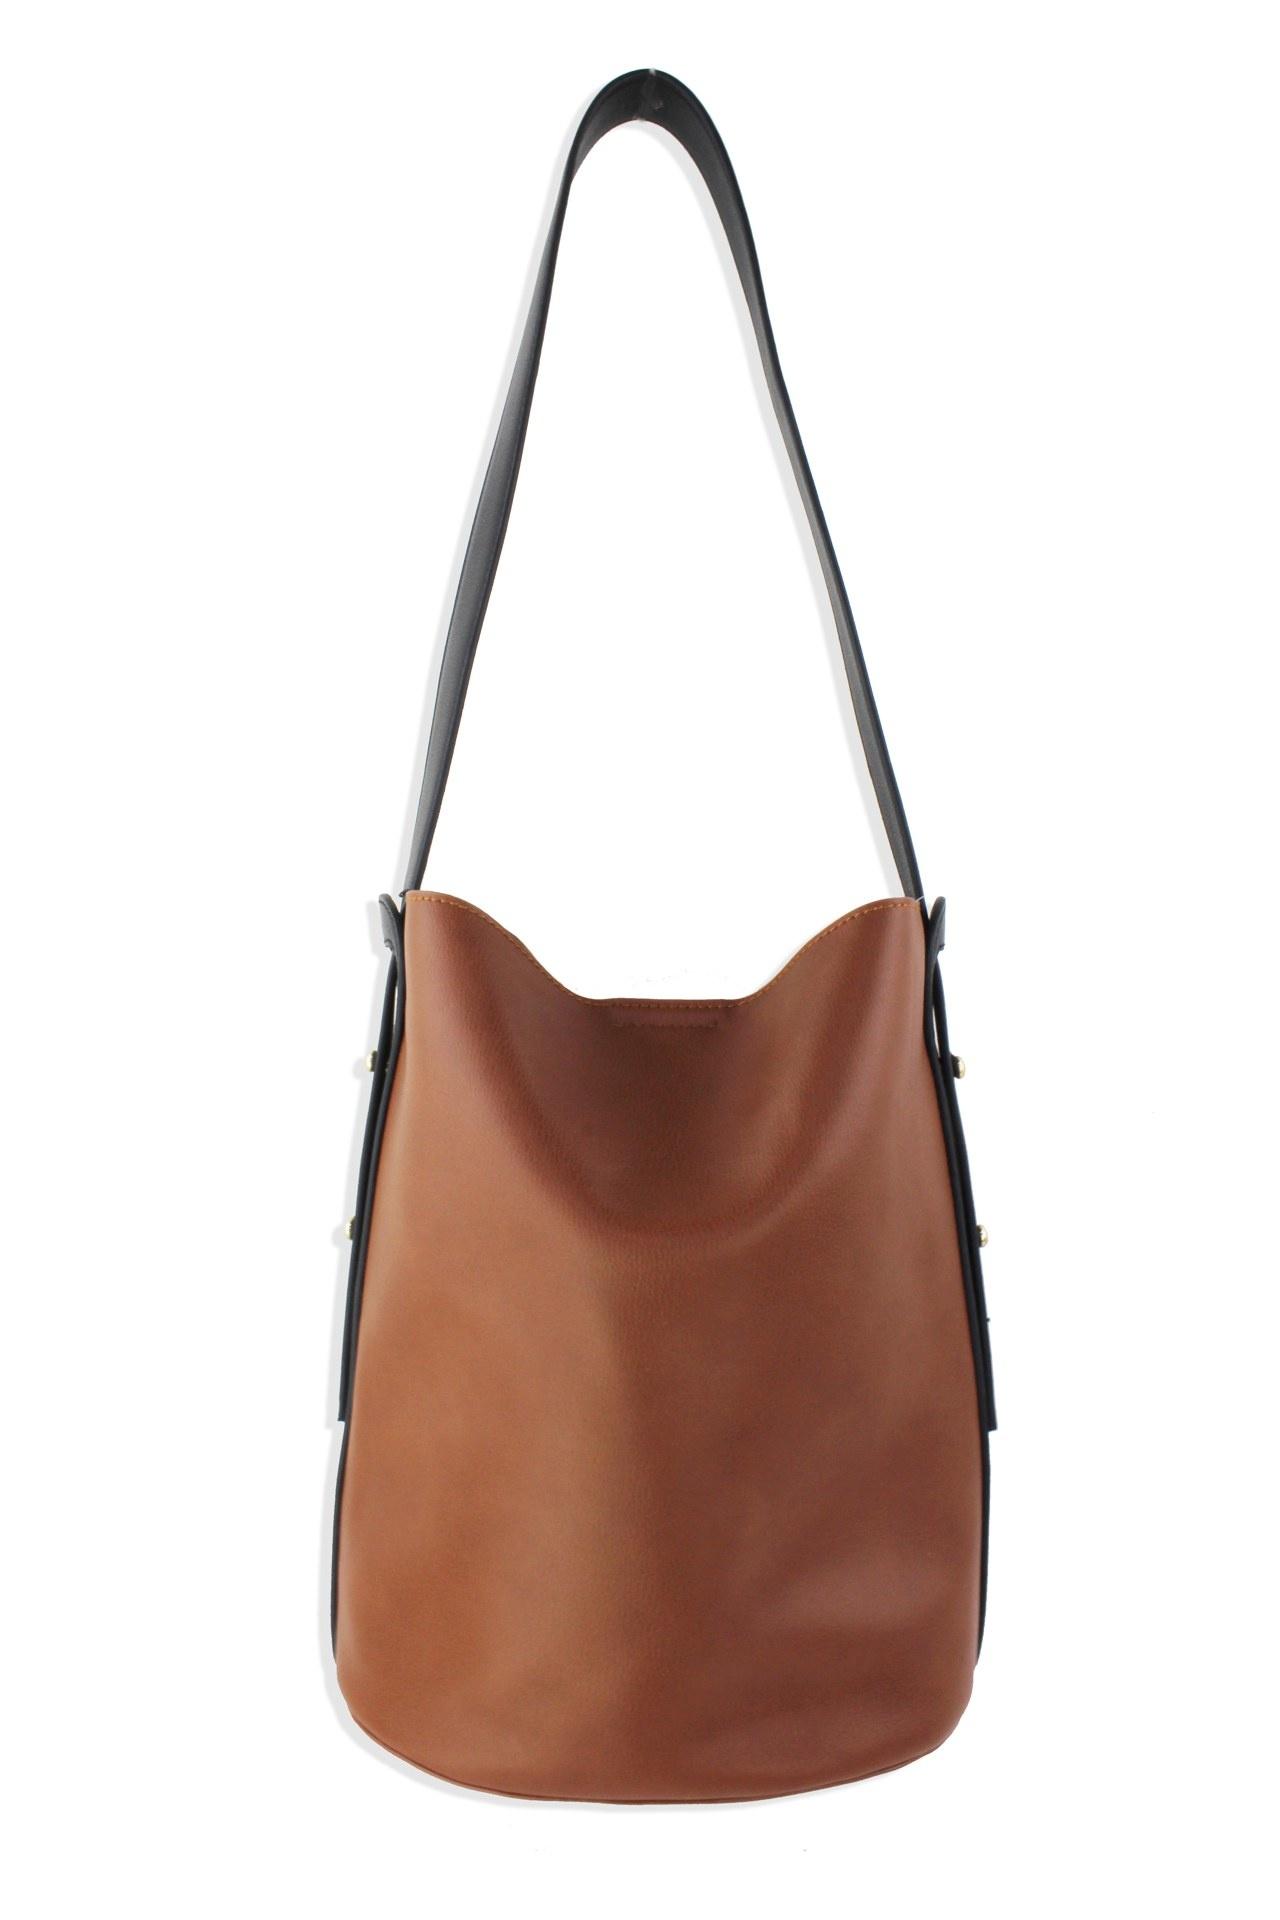 Street Level Two Tone Bucket Bag